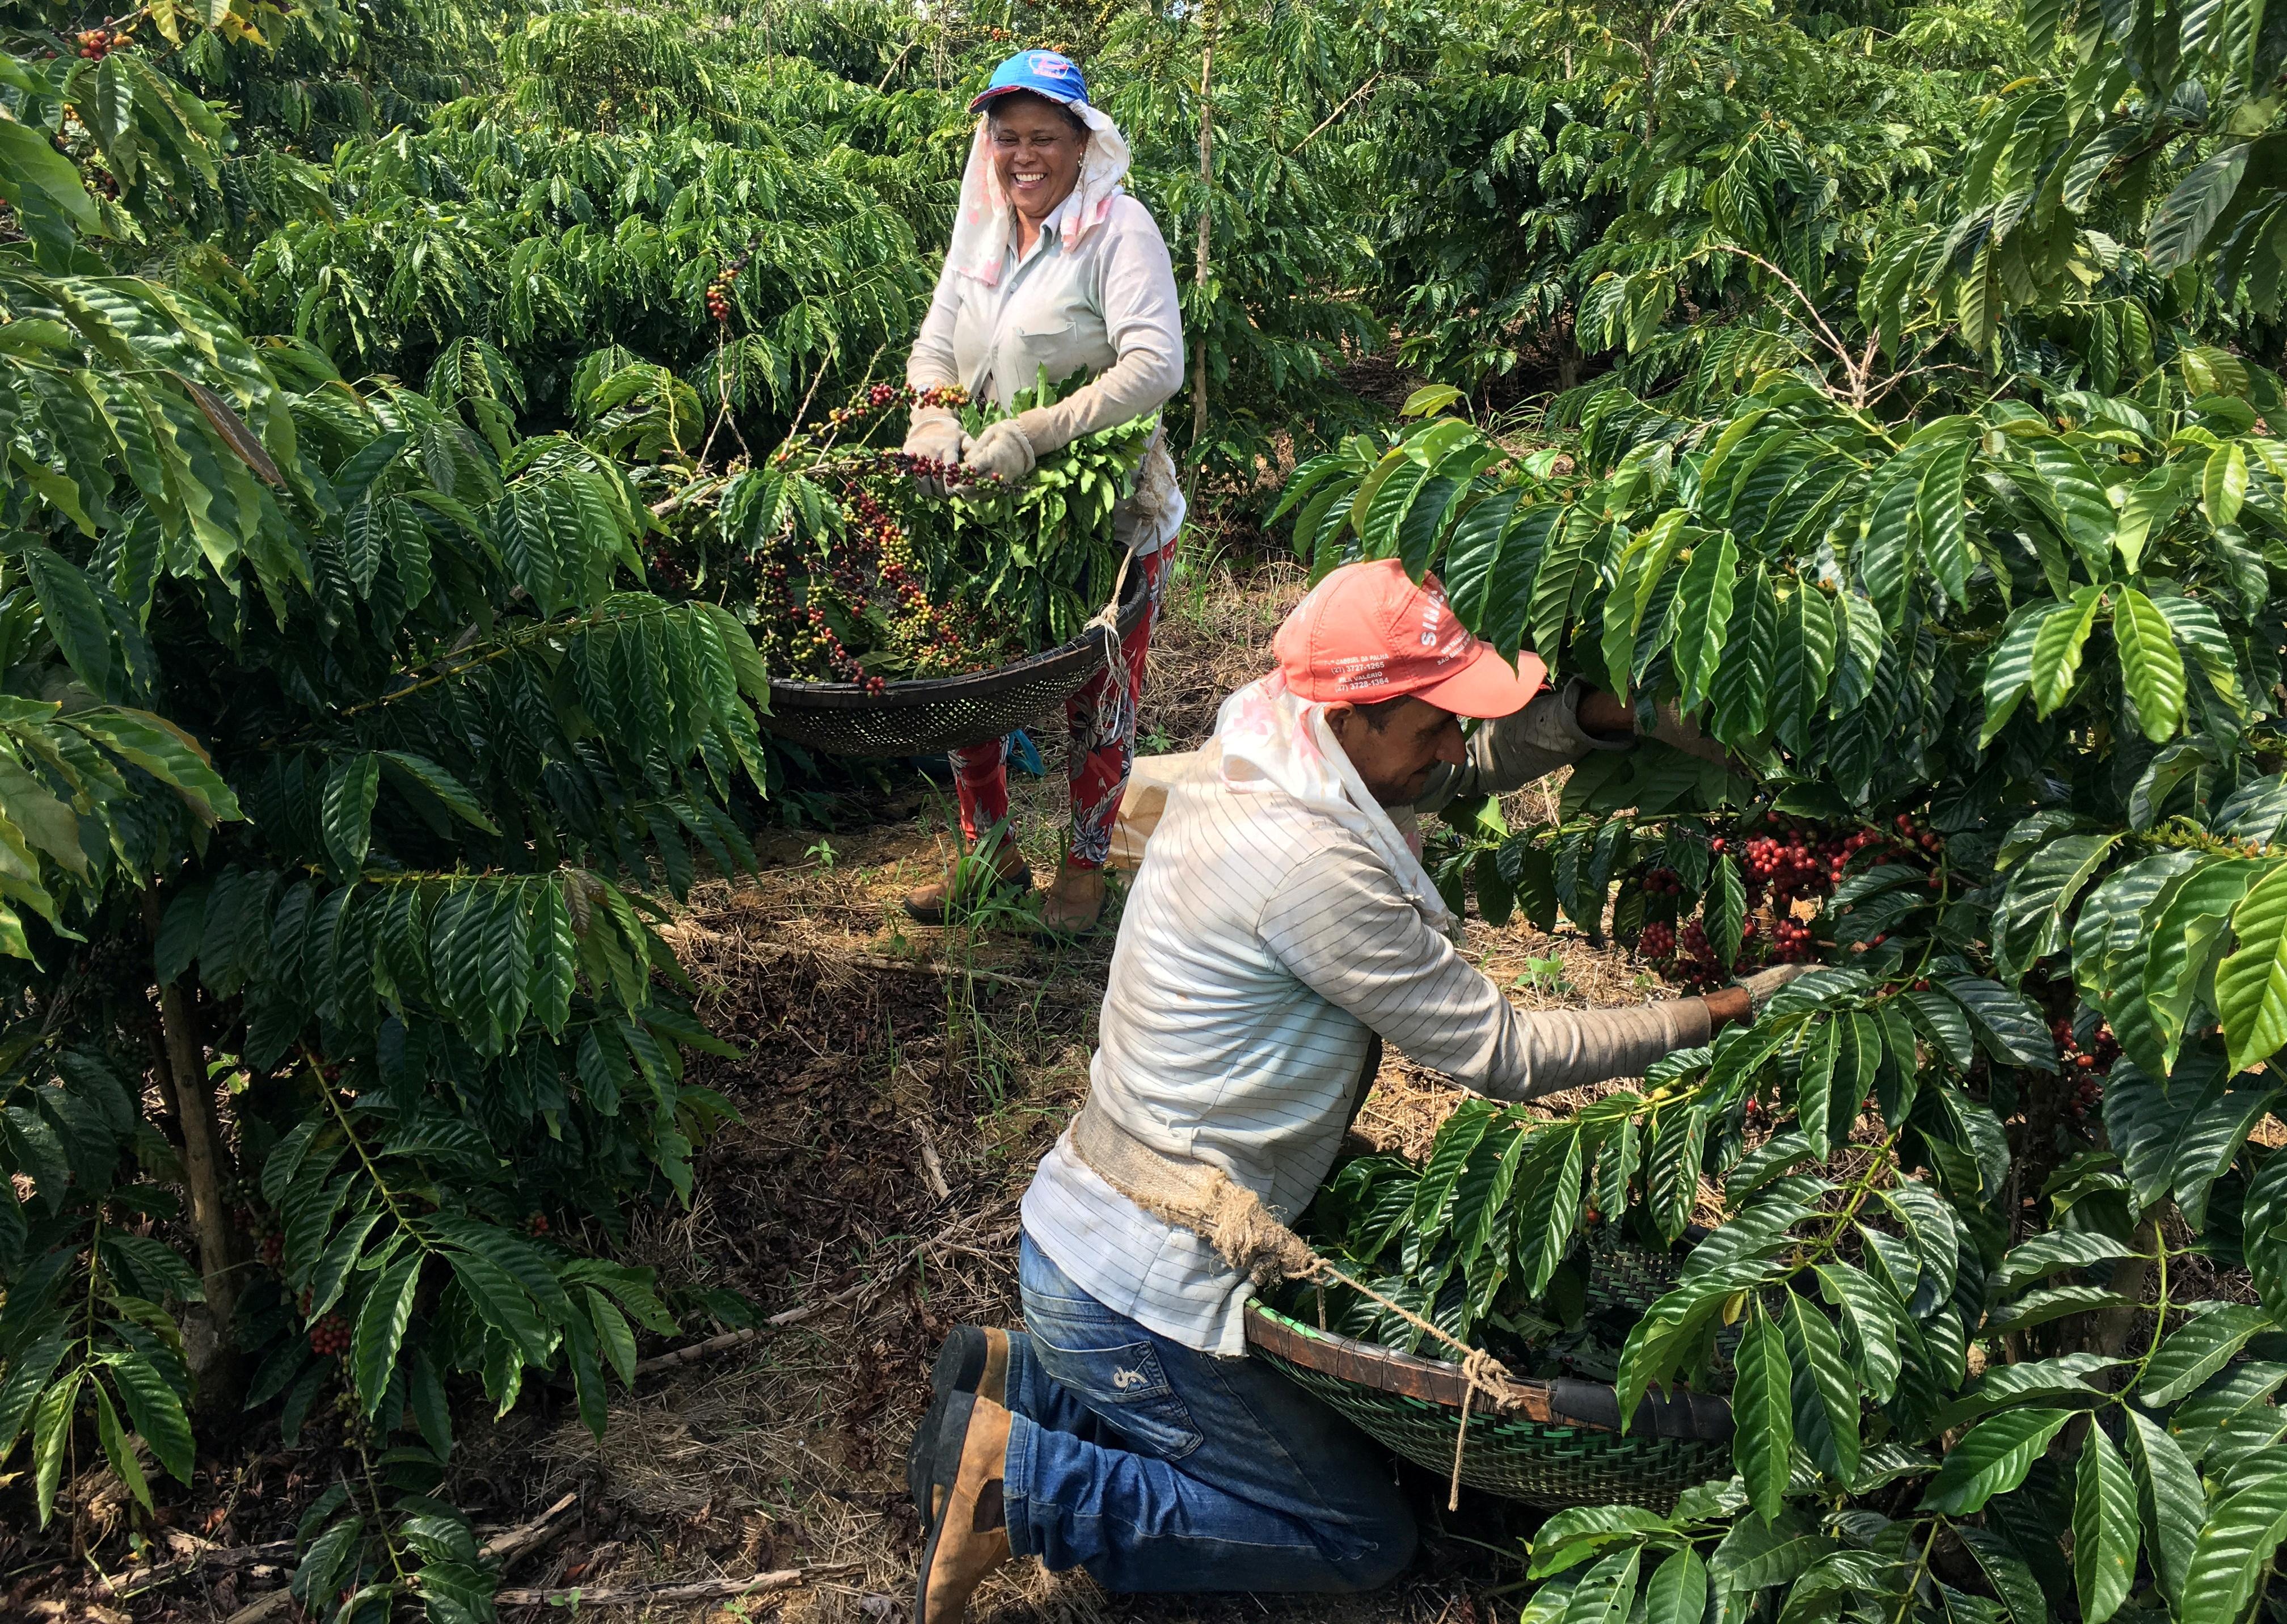 Workers harvest robusta coffee in Sao Gabriel da Palha, Espirito Santo state, Brazil May 2, 2018. Picture taken May 2, 2018. REUTERS/Jose Roberto Gomes